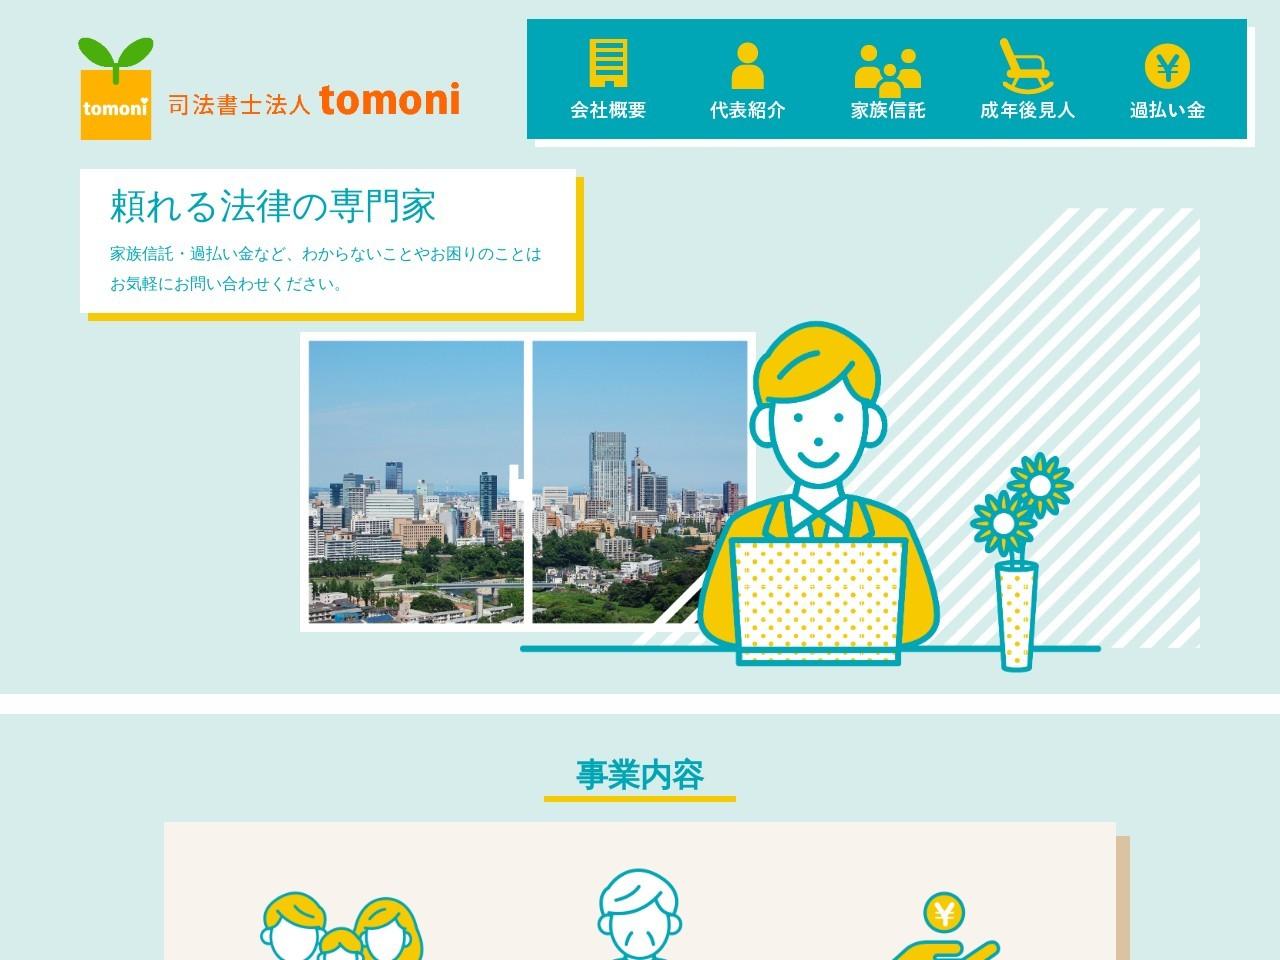 tomoni(司法書士法人)